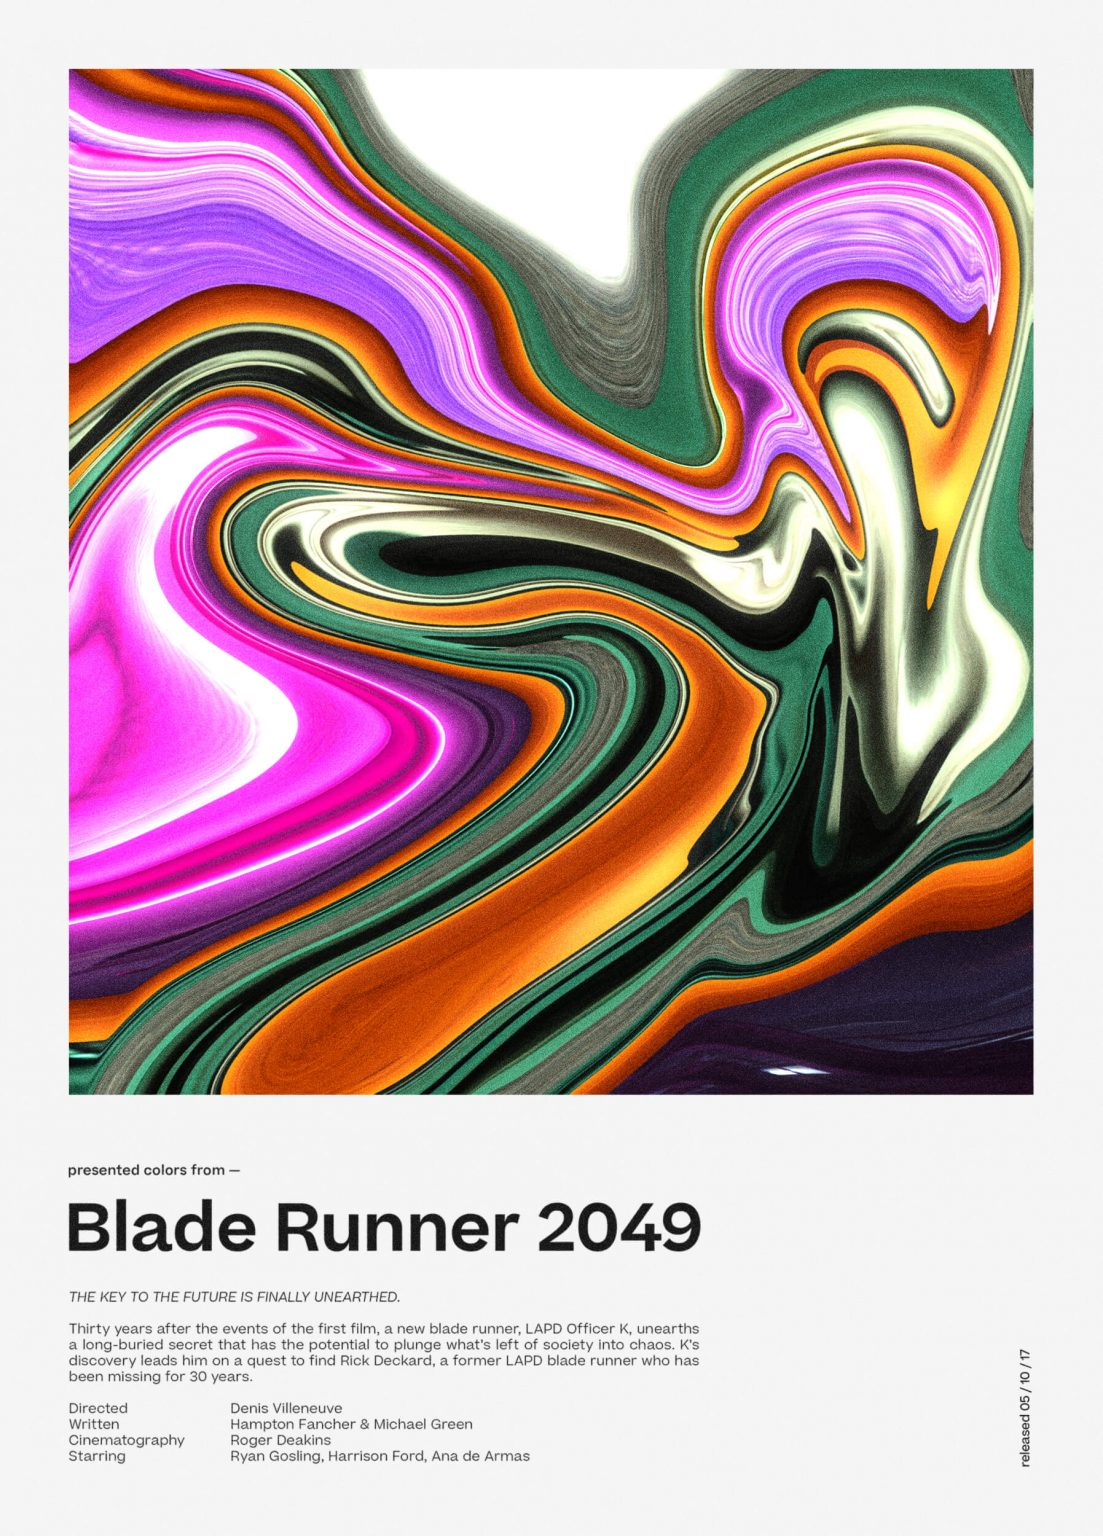 Niklas Beab Blade Runner 2049 Poster Design